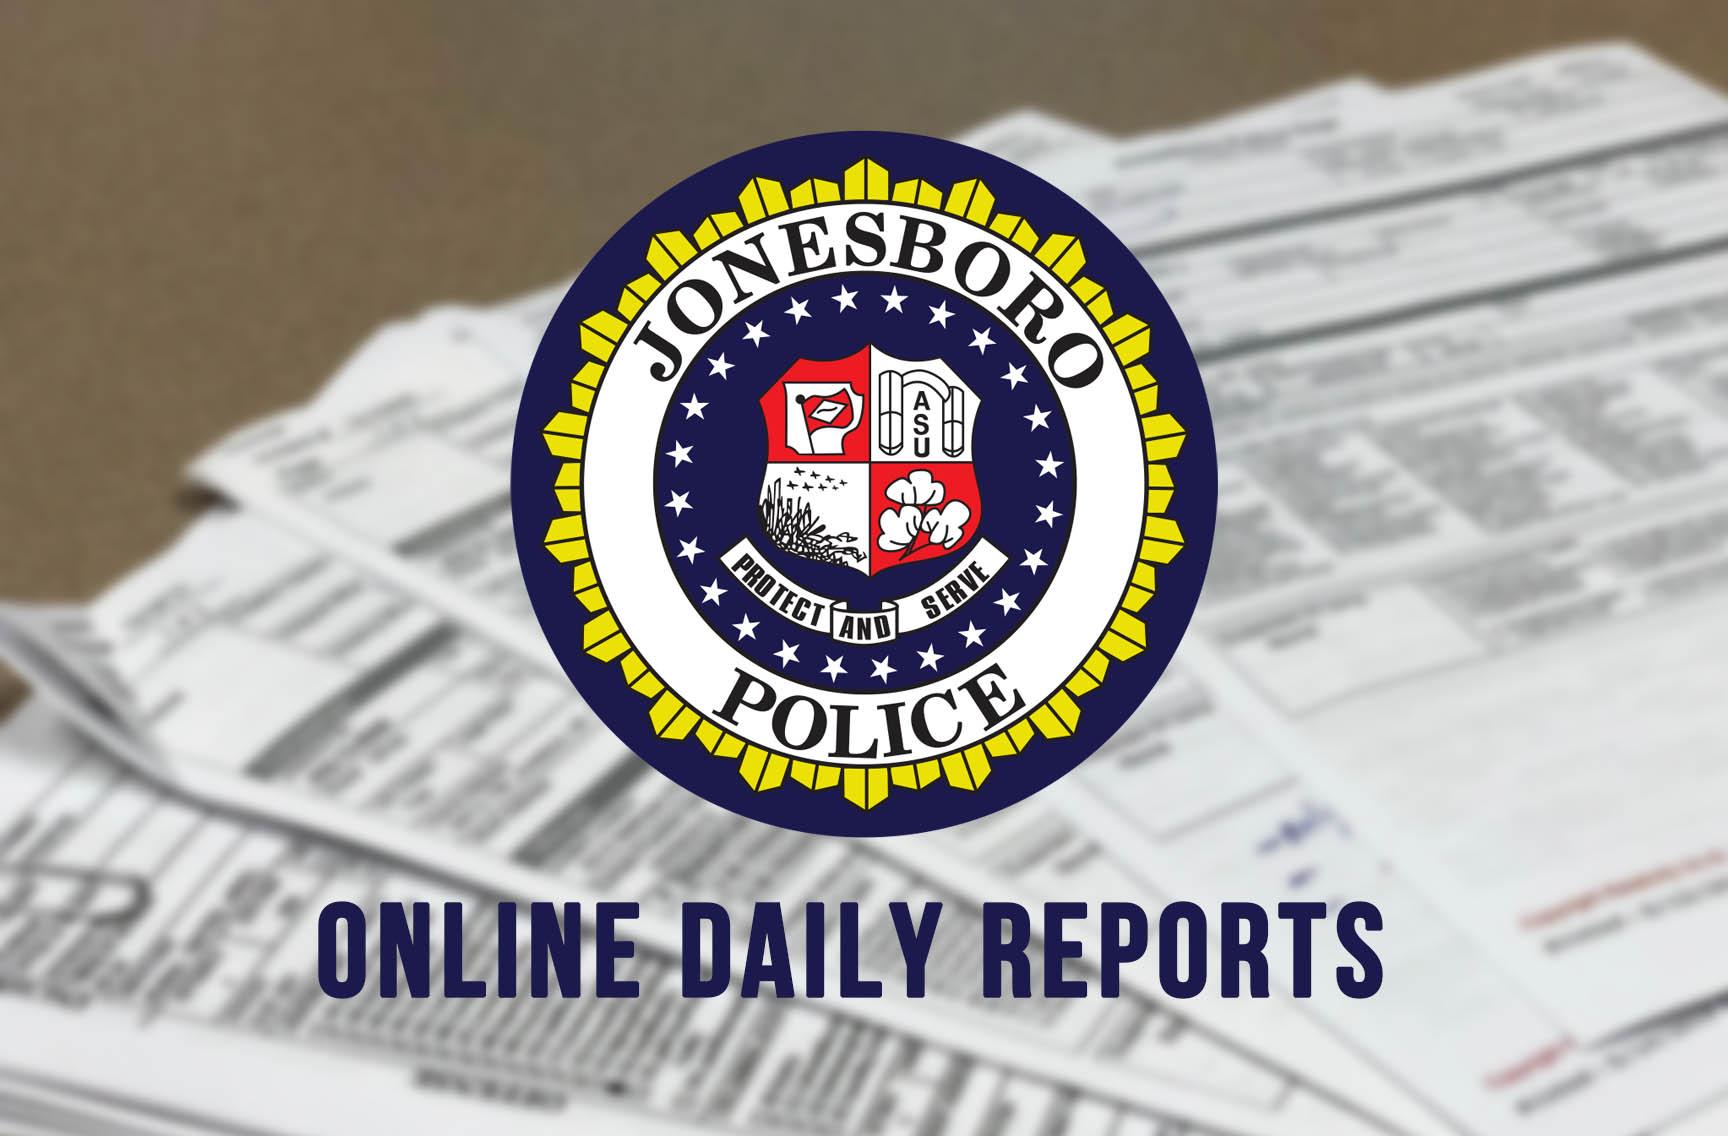 View Daily Police Reports Online — Jonesboro Police Department